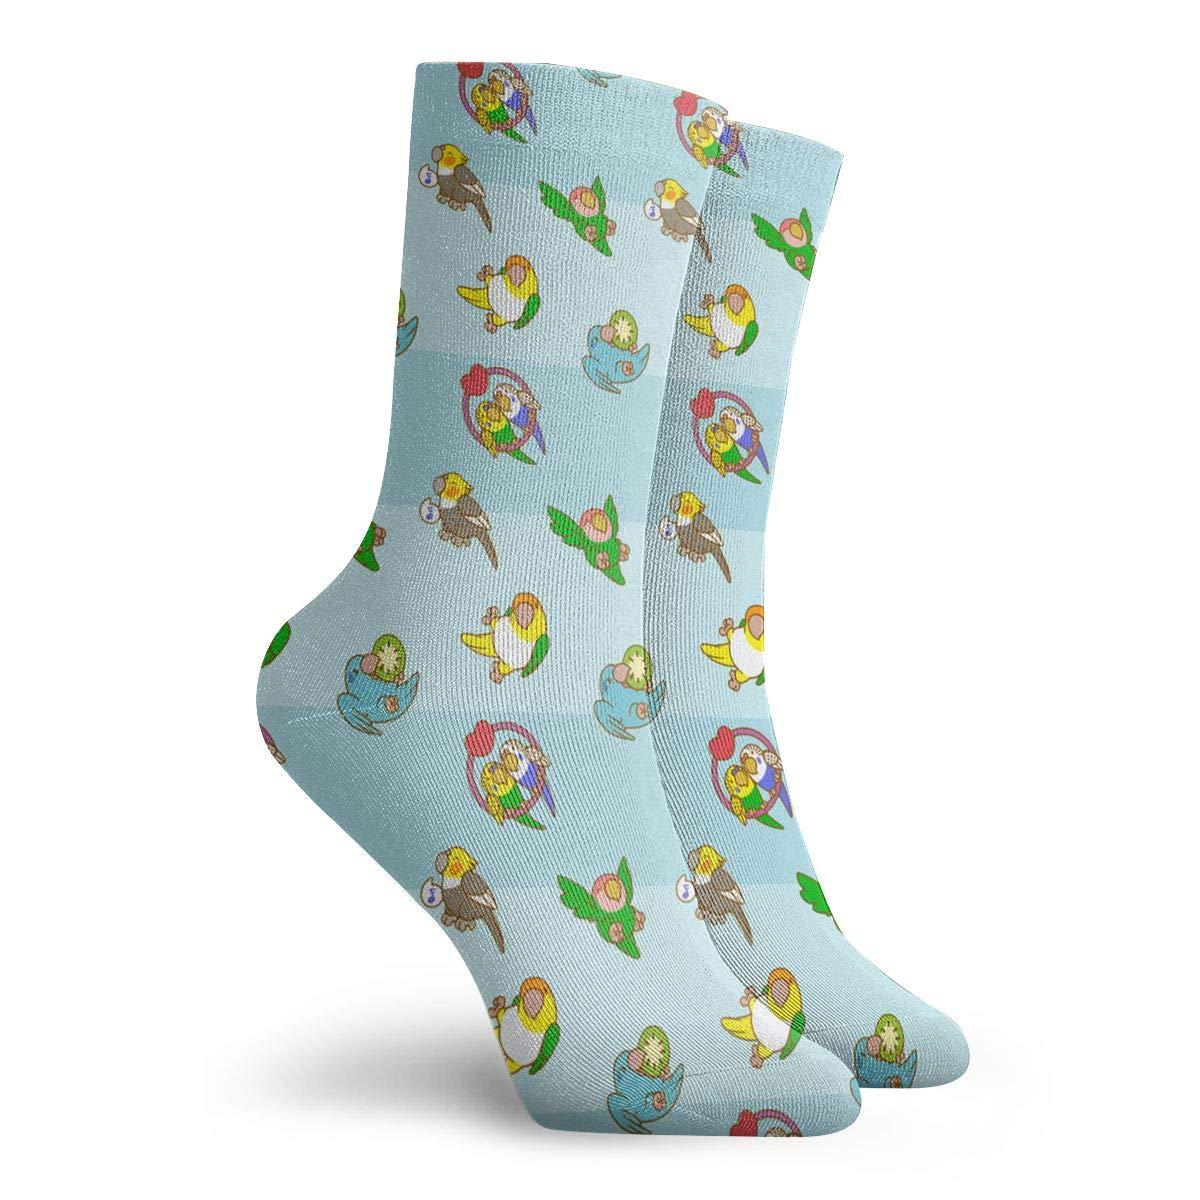 Cute Cartoon Parrots Pattern Unisex Funny Casual Crew Socks Athletic Socks For Boys Girls Kids Teenagers